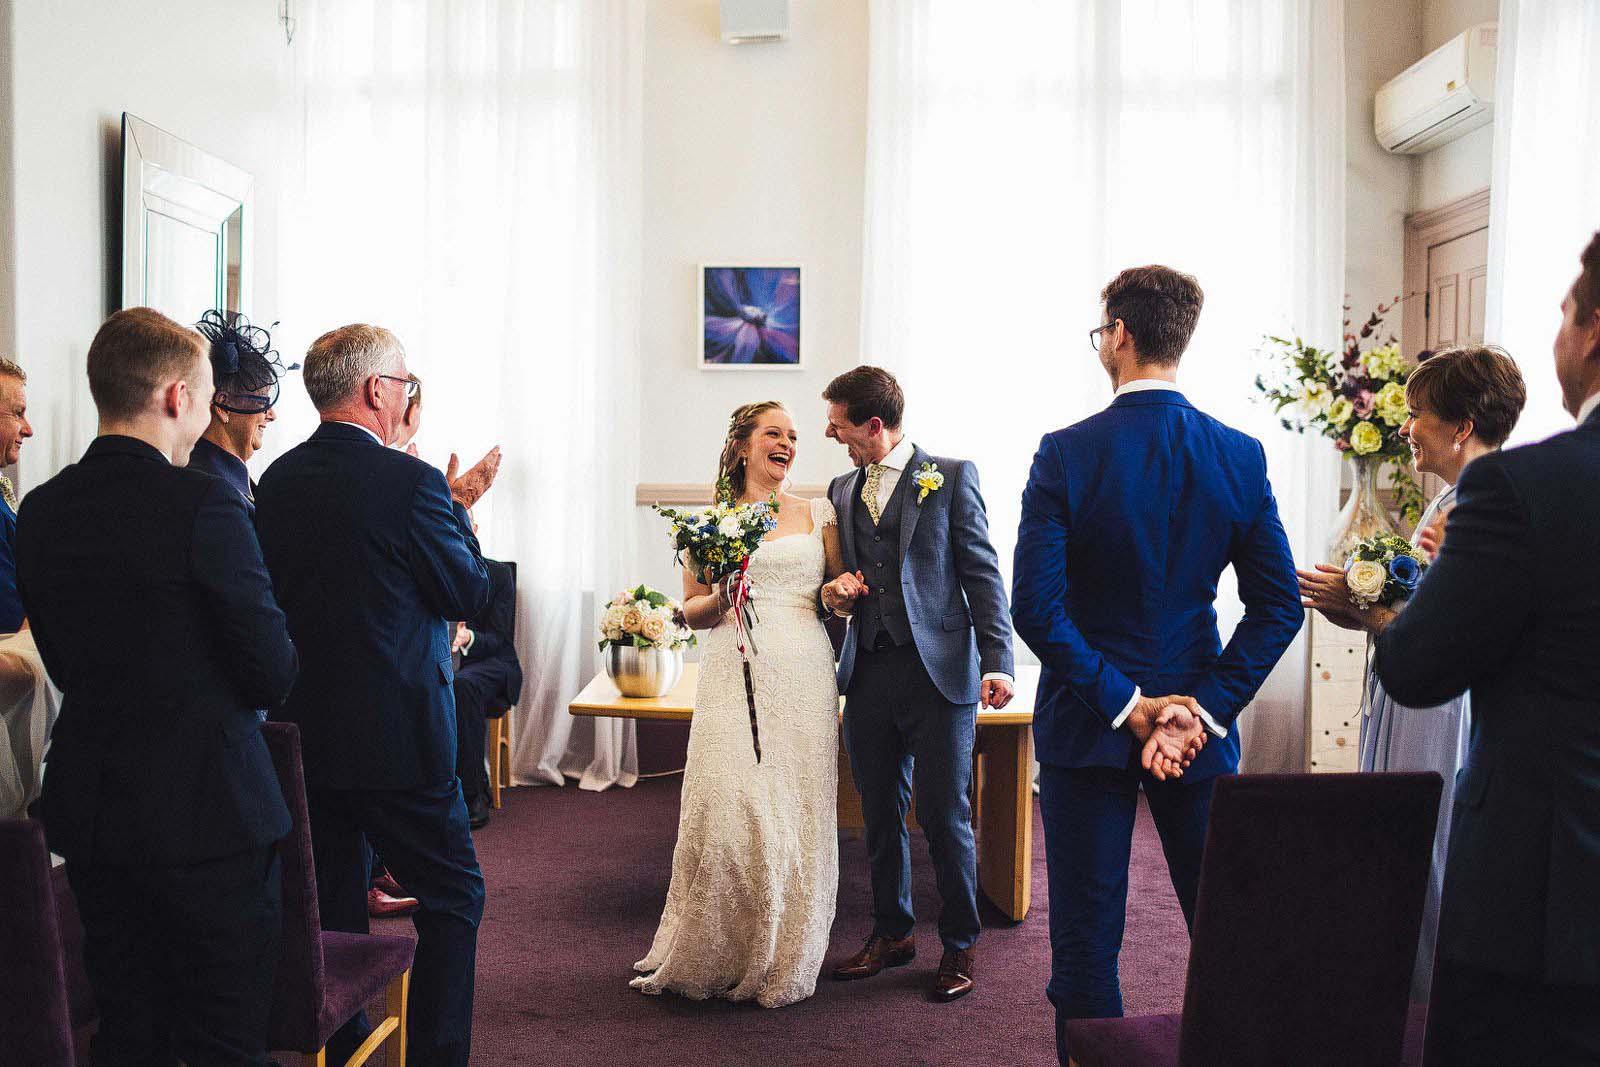 Leeds wedding venue